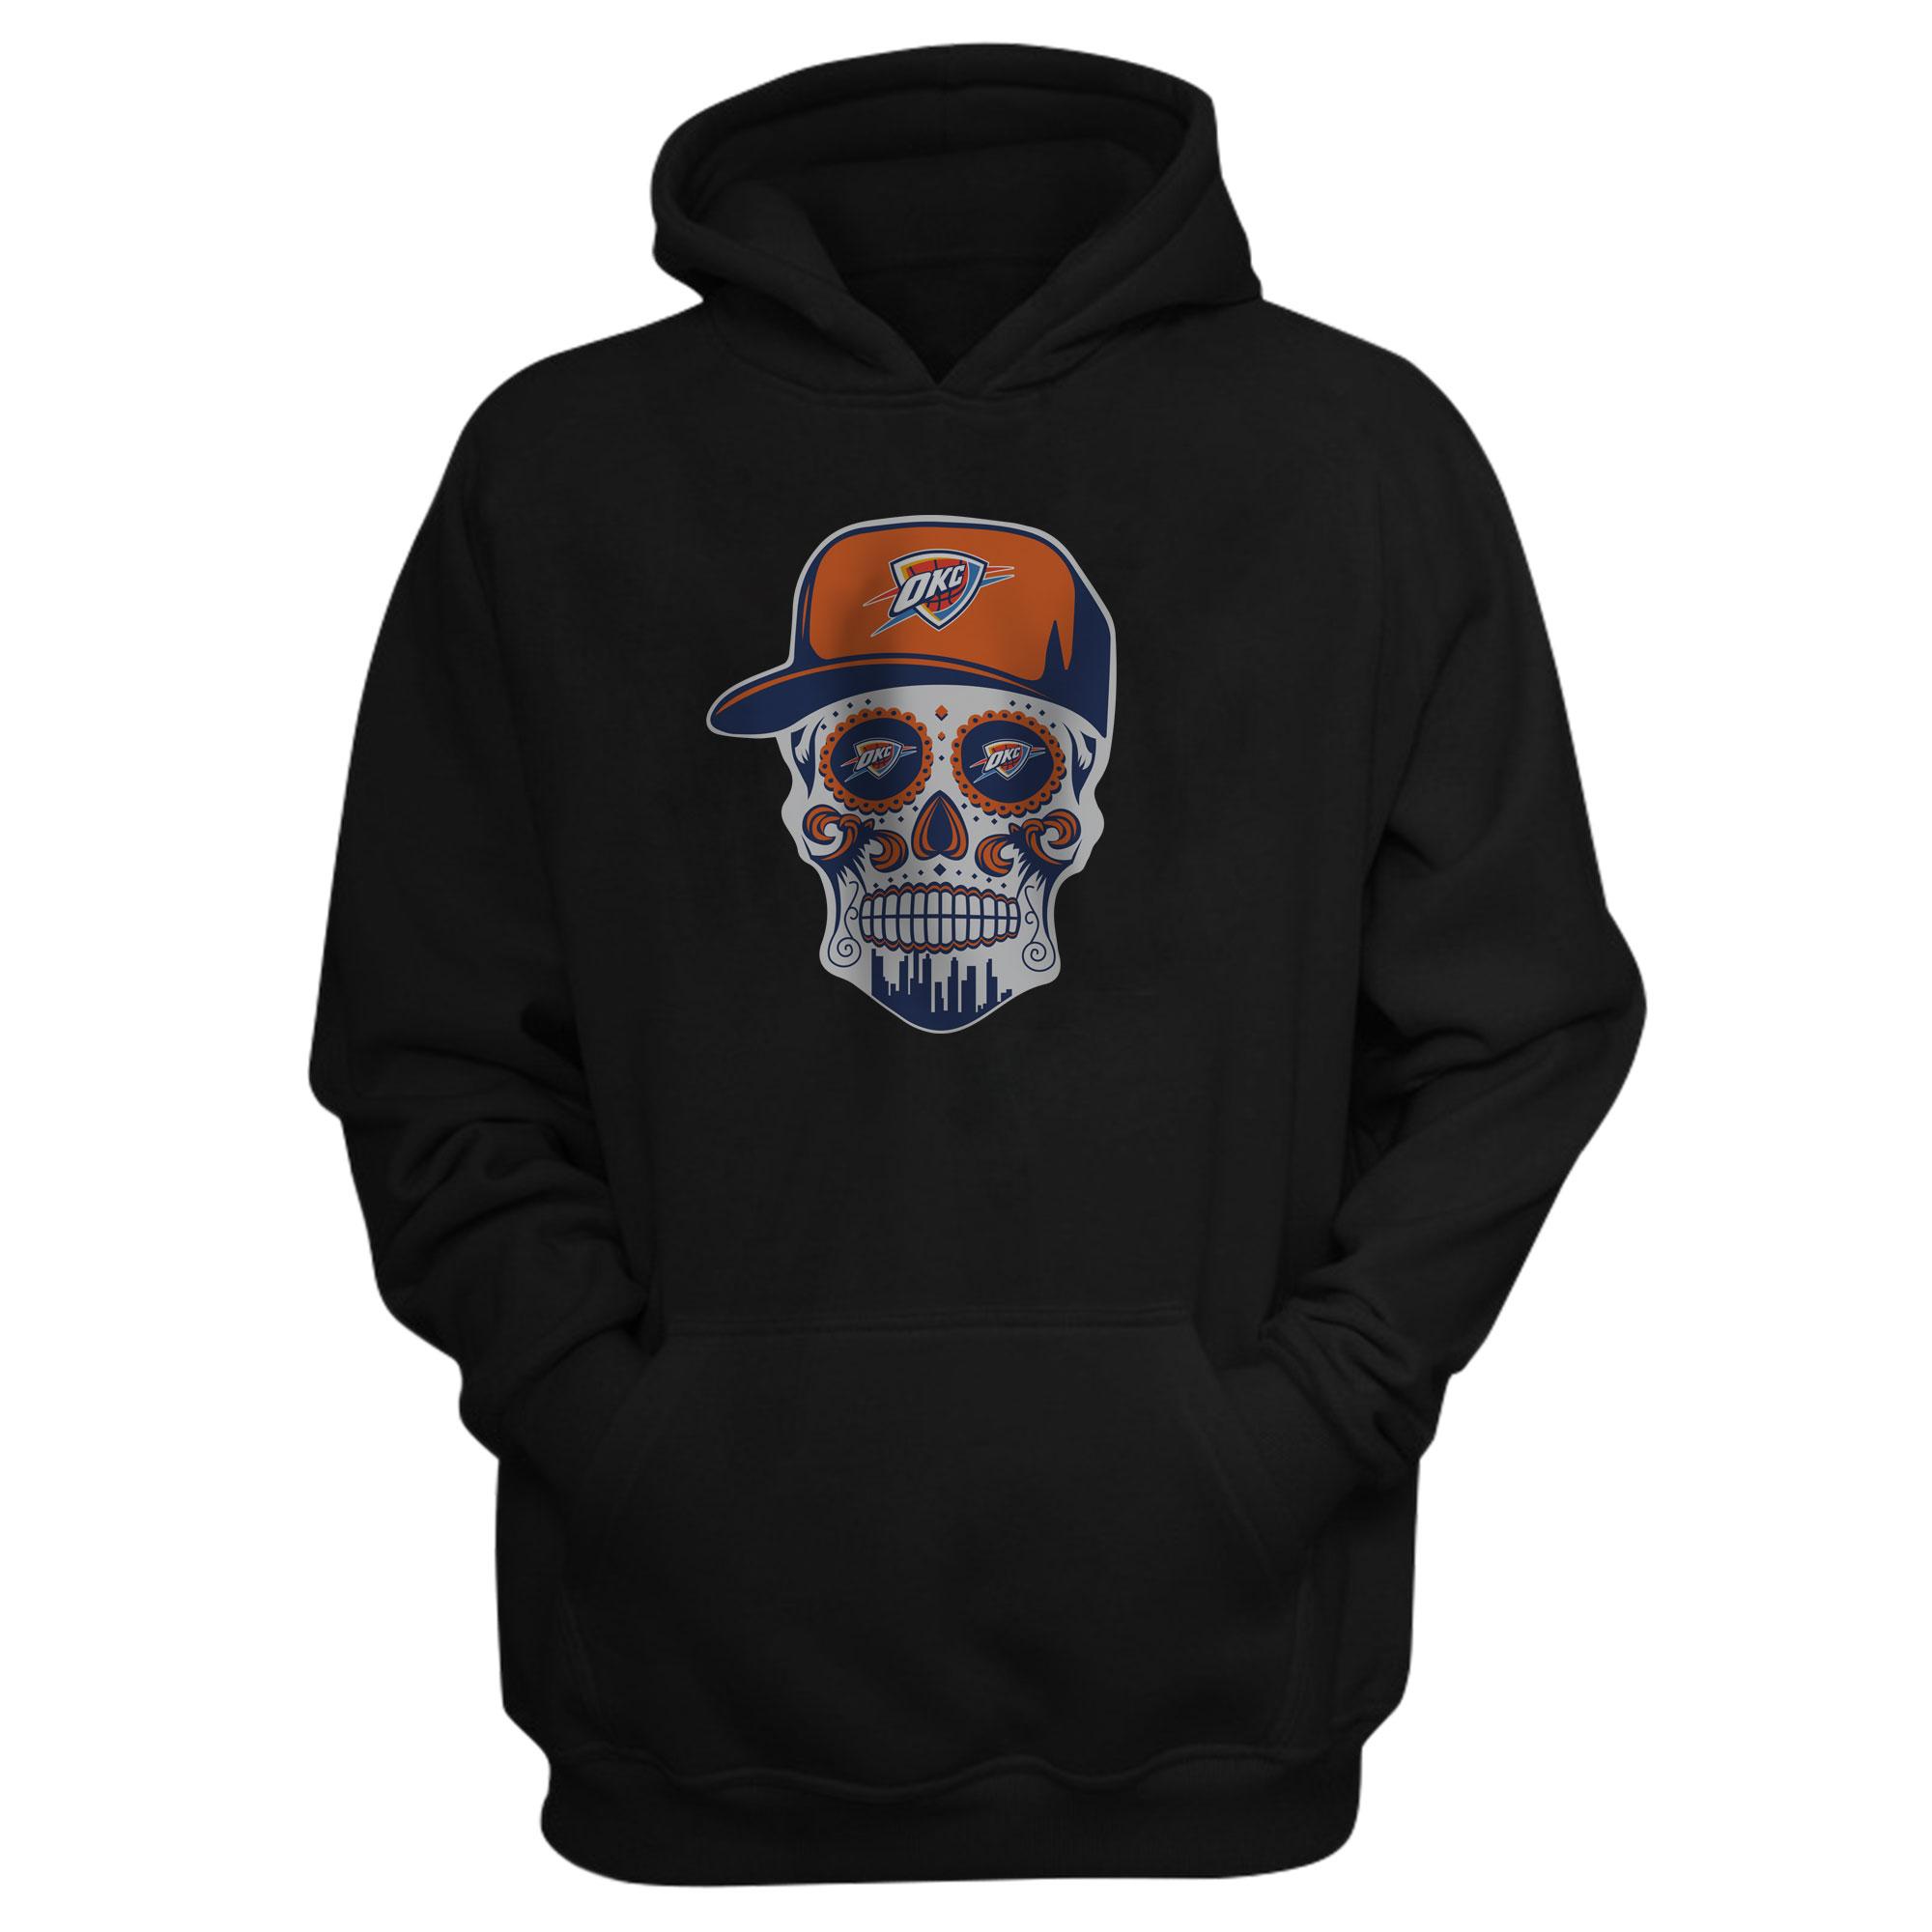 Thunder Skull  Hoodie  (HD-BLC-NP-459-NBA-OKC-SKULL)